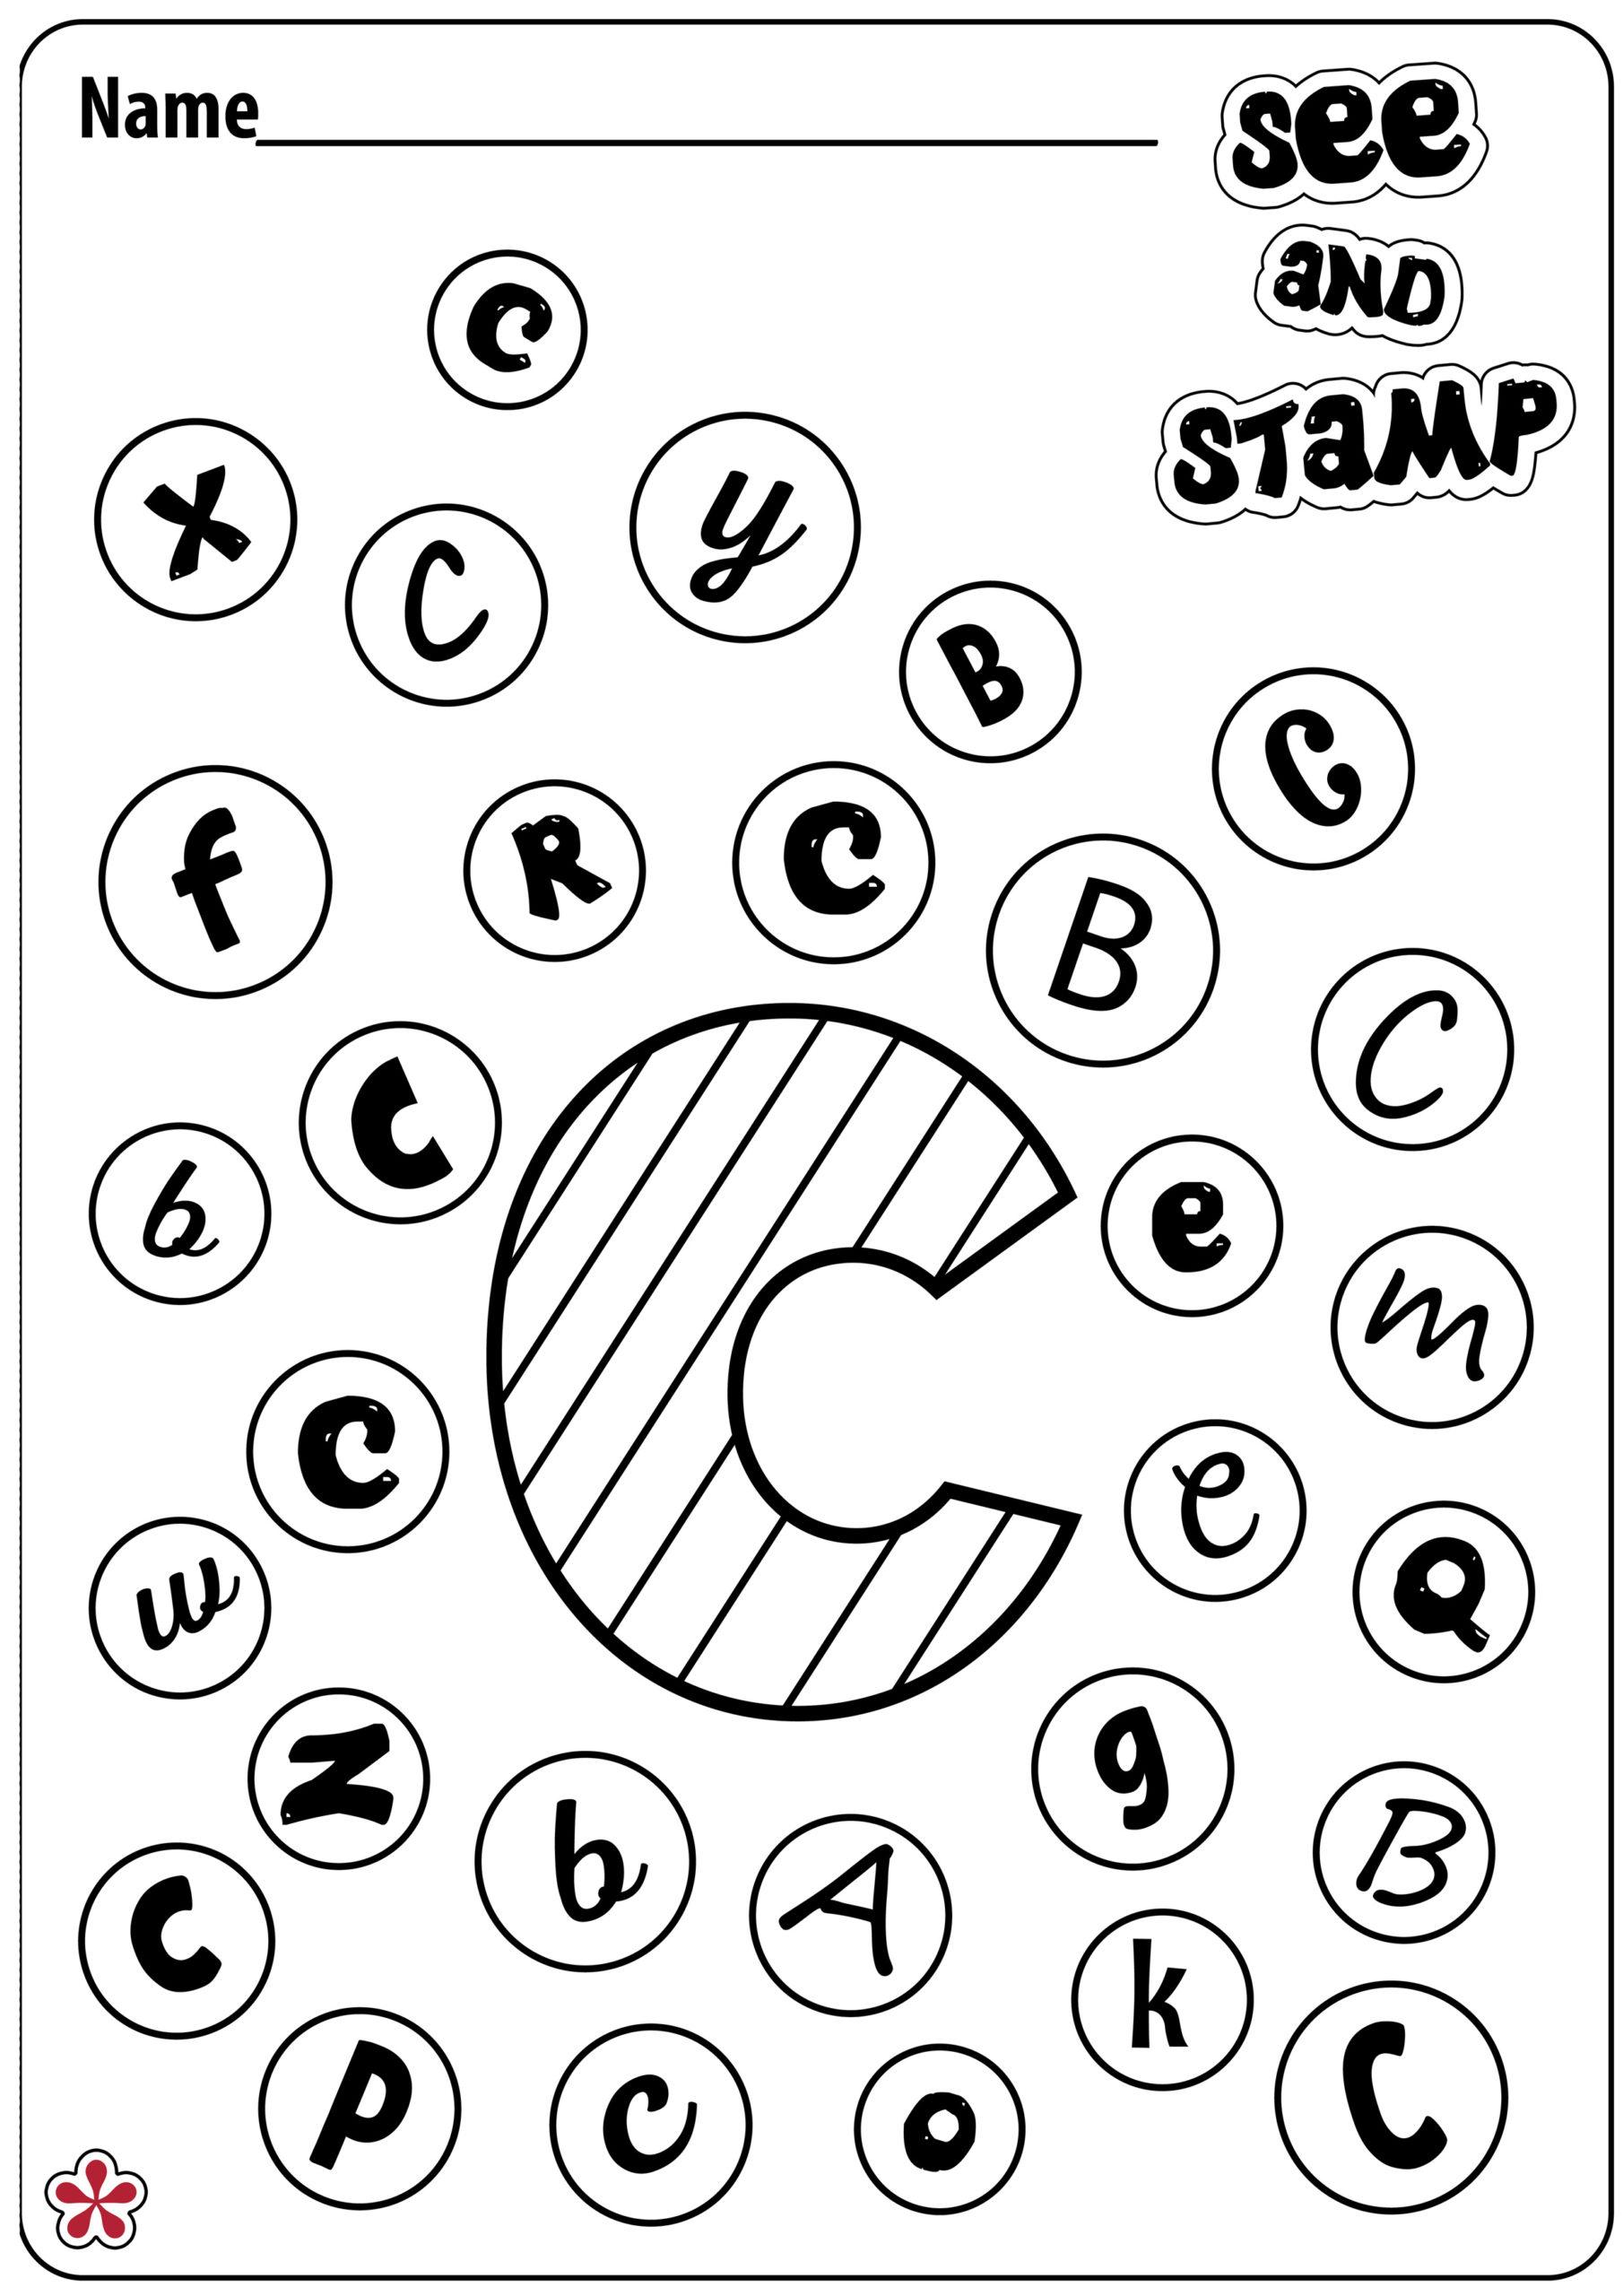 Worksheet ~ Cbs 7Th Math Free Printable Preschool Halloween